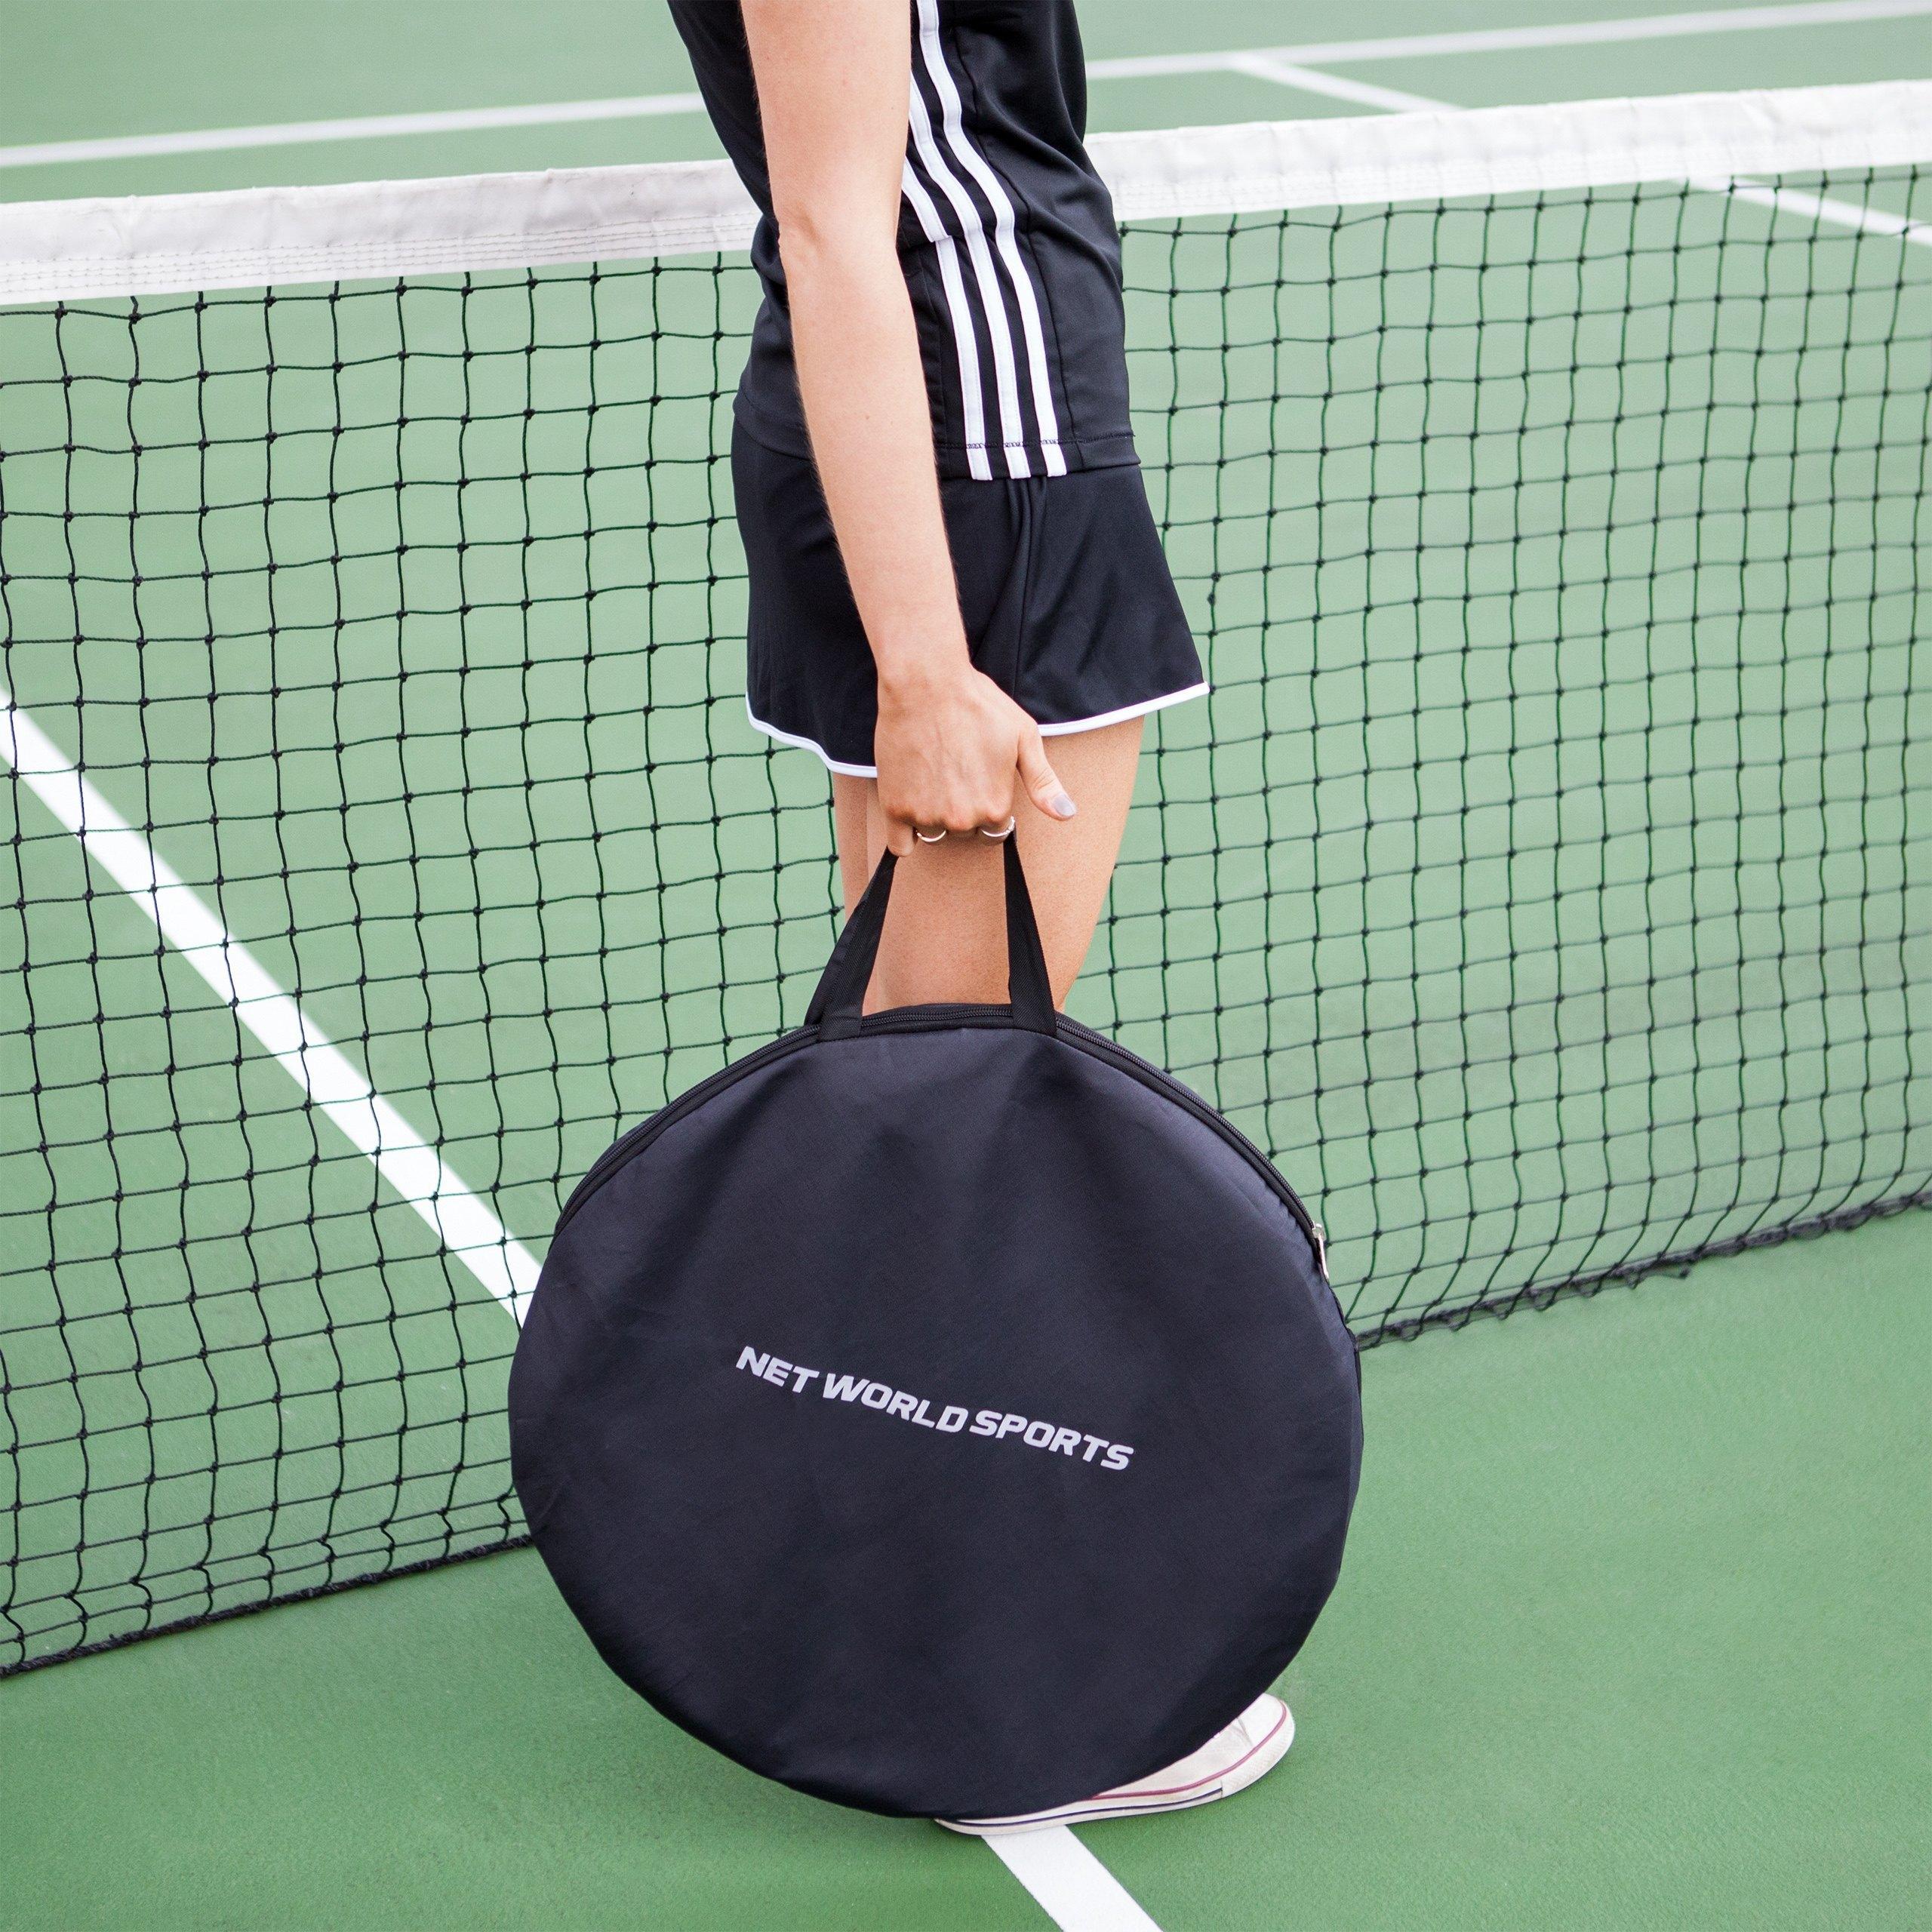 Tennis Net Target Carry Bags